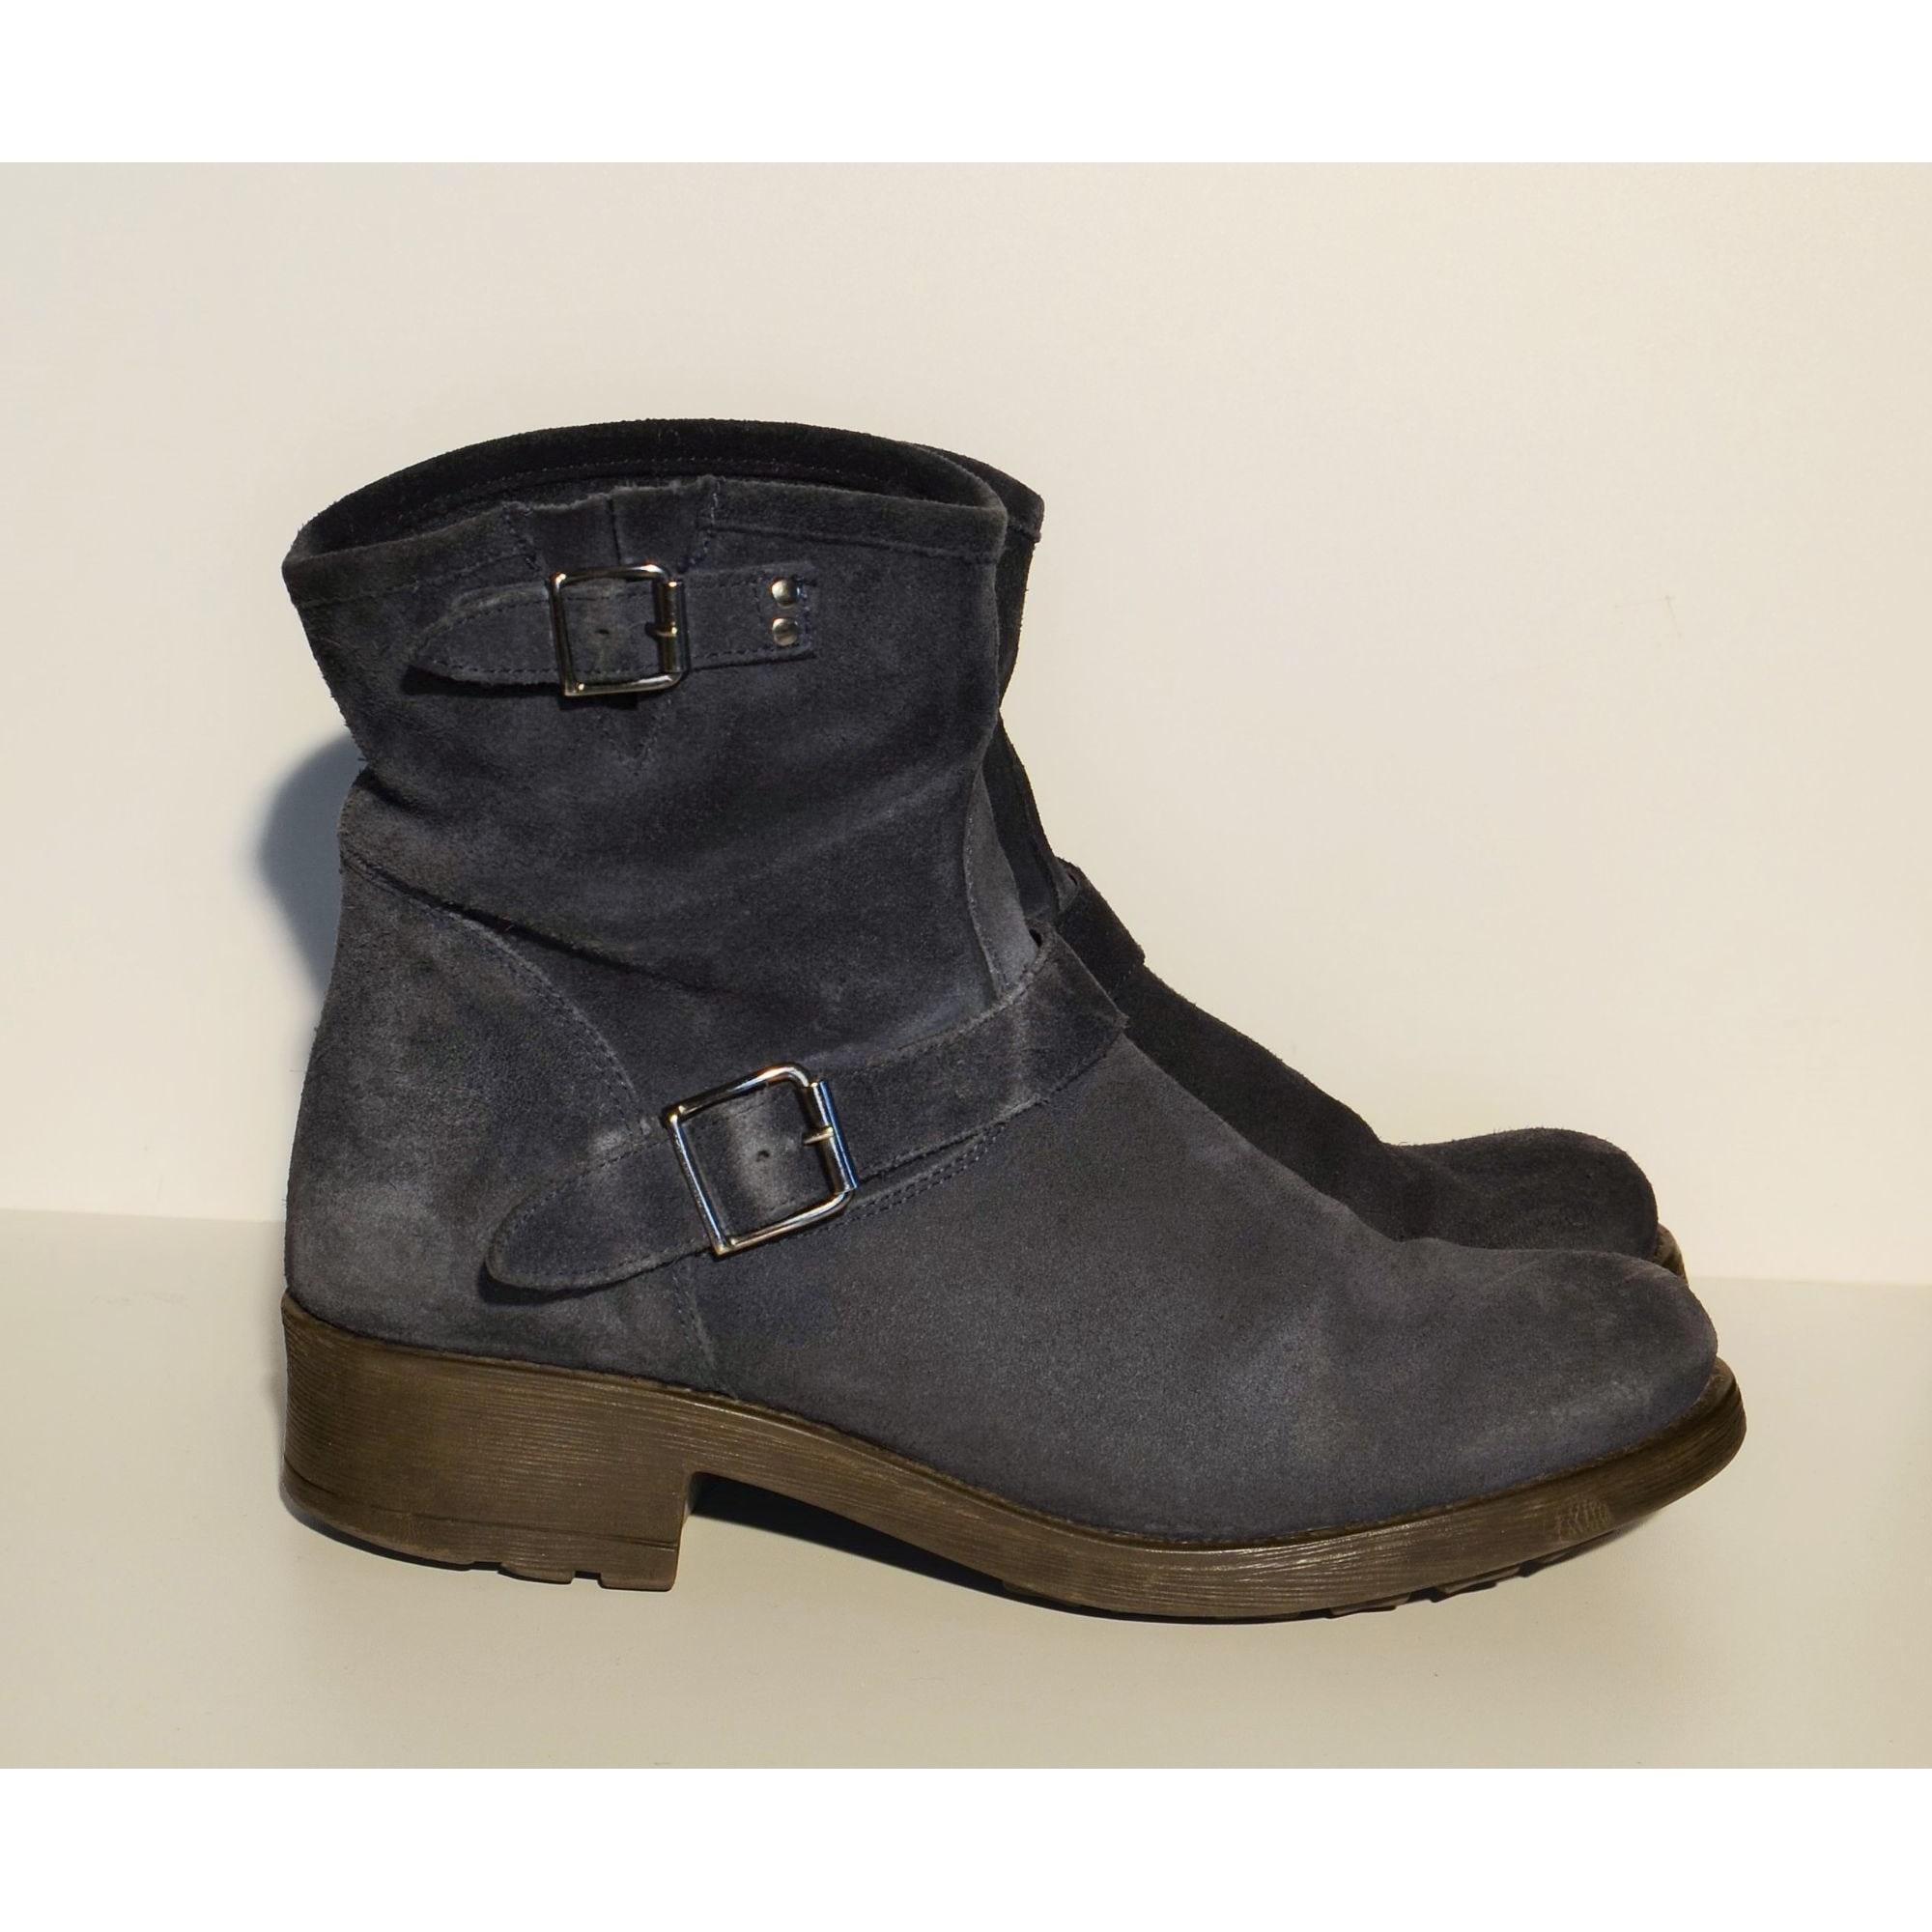 Bottines & low boots à talons TEXTO Bleu, bleu marine, bleu turquoise